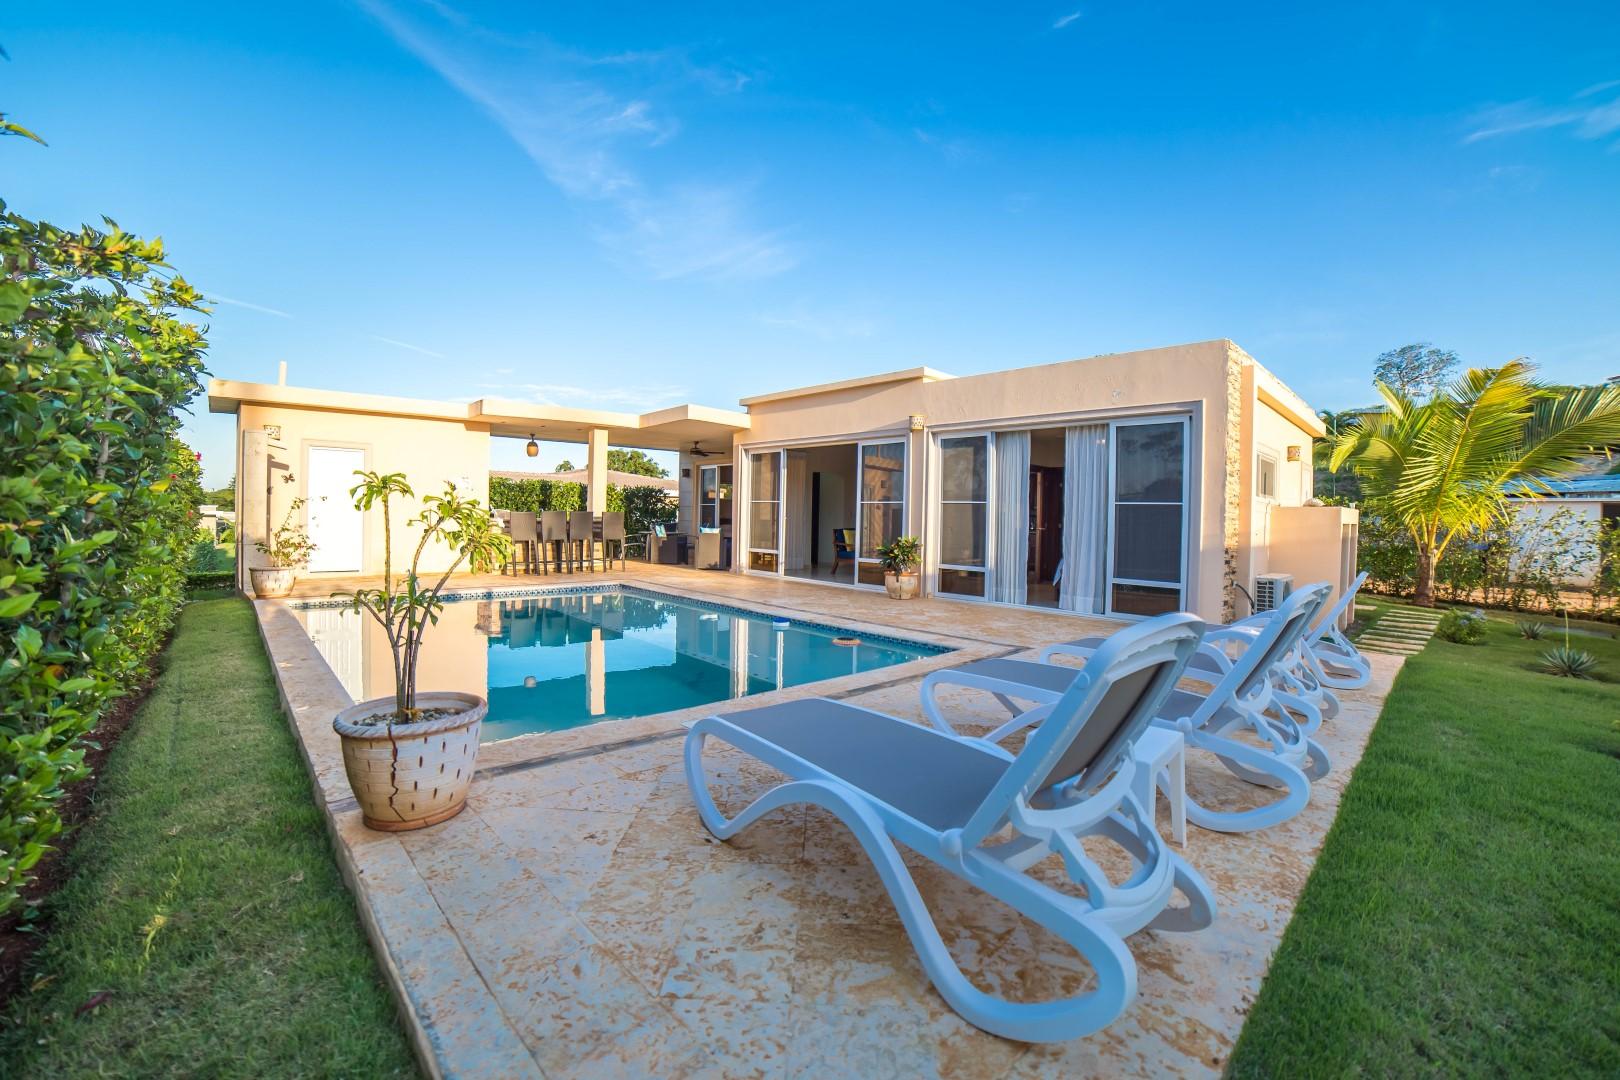 2 bedroom Charming Villa Sosua Rental Dominican